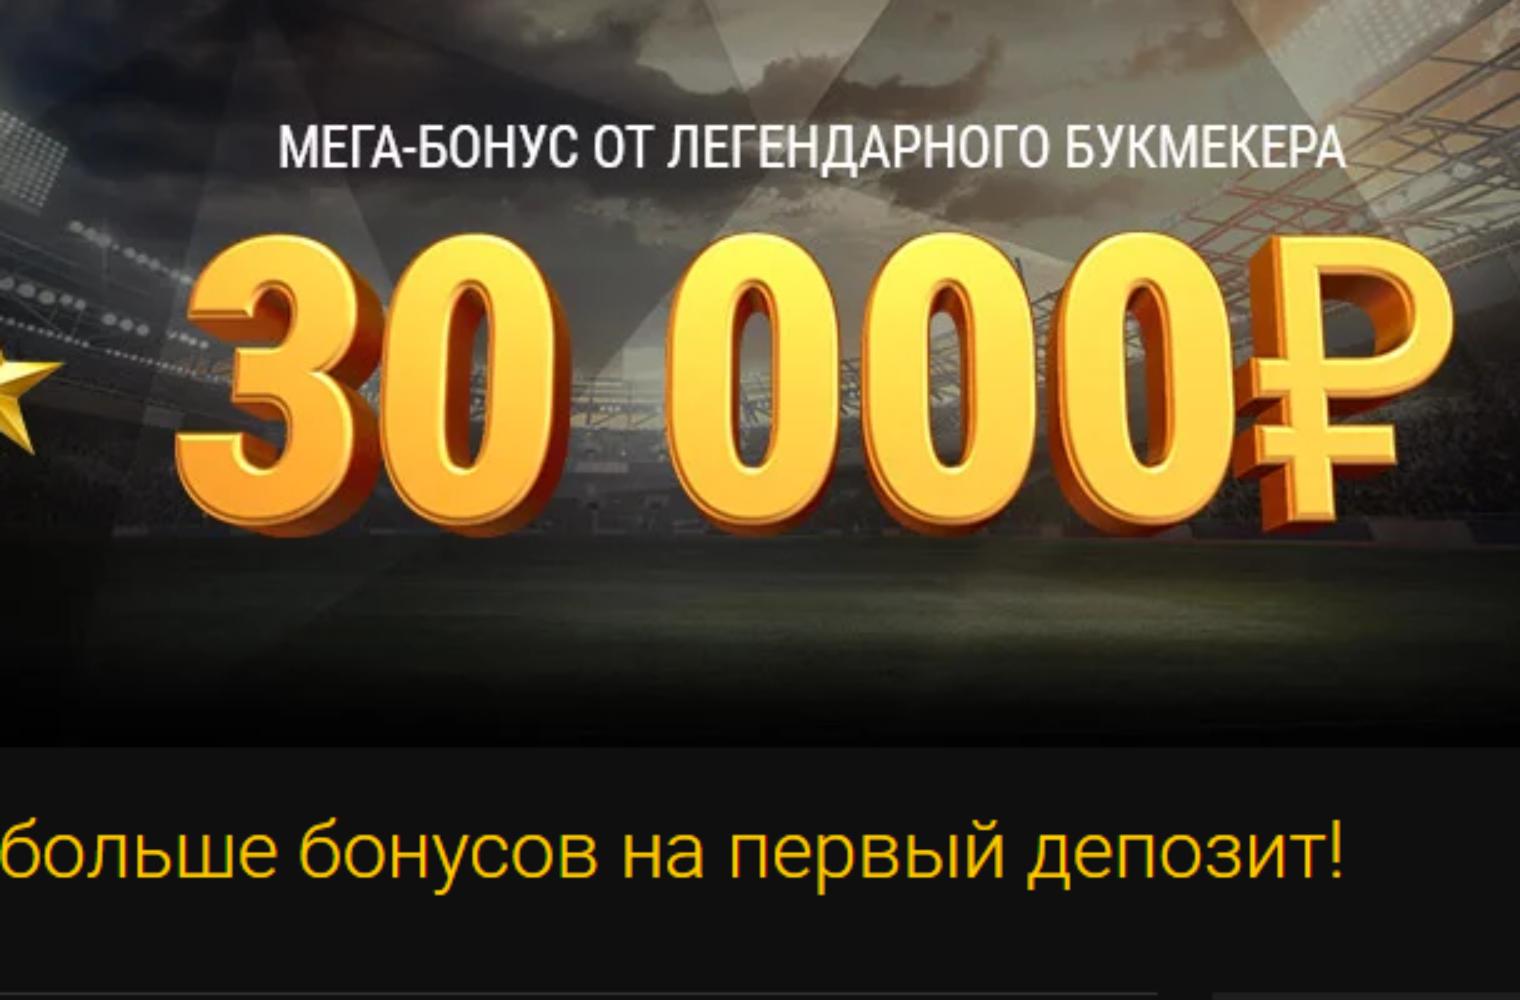 100 проц. прог. спорта букмекеров